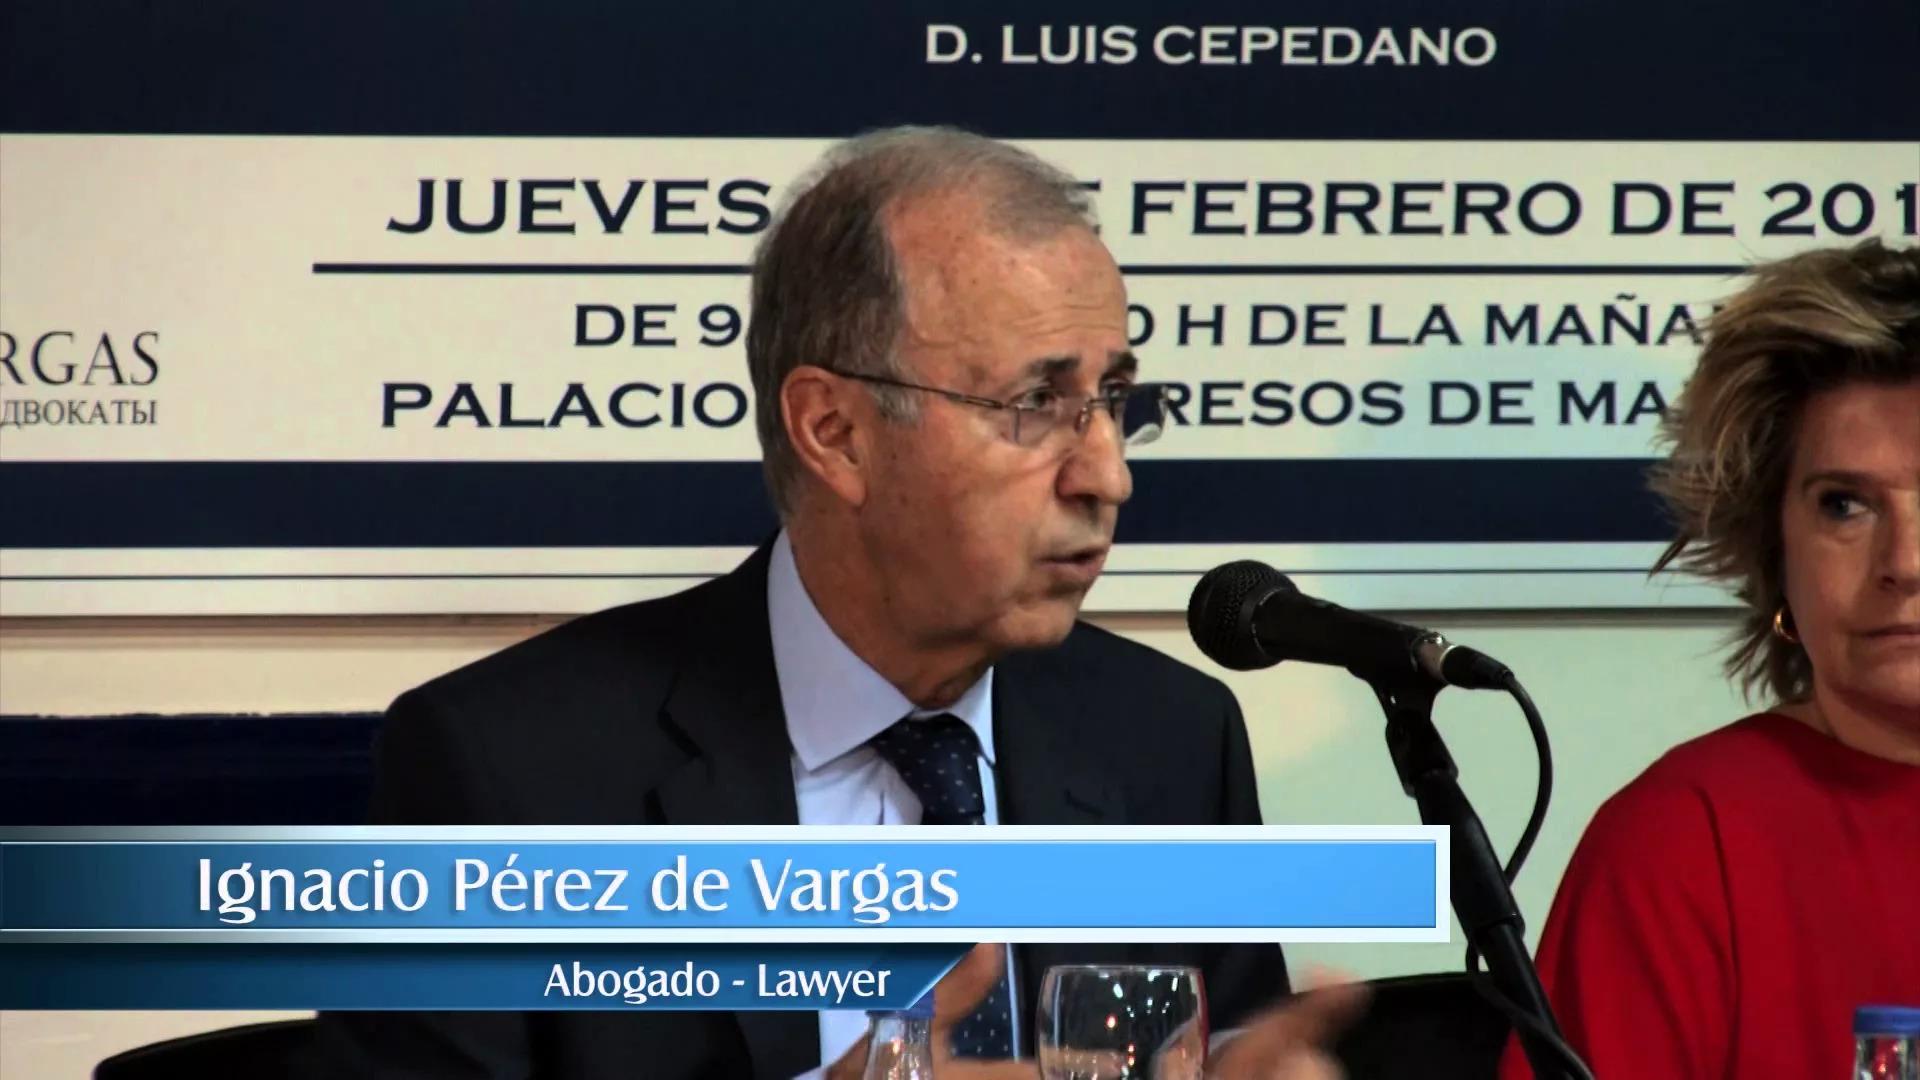 SEMINARIO TEMÁTICO PROFESIONAL  ADAPTACIÓN A LA LOUA DEL PGOU DE MARBELLA DE 1986.